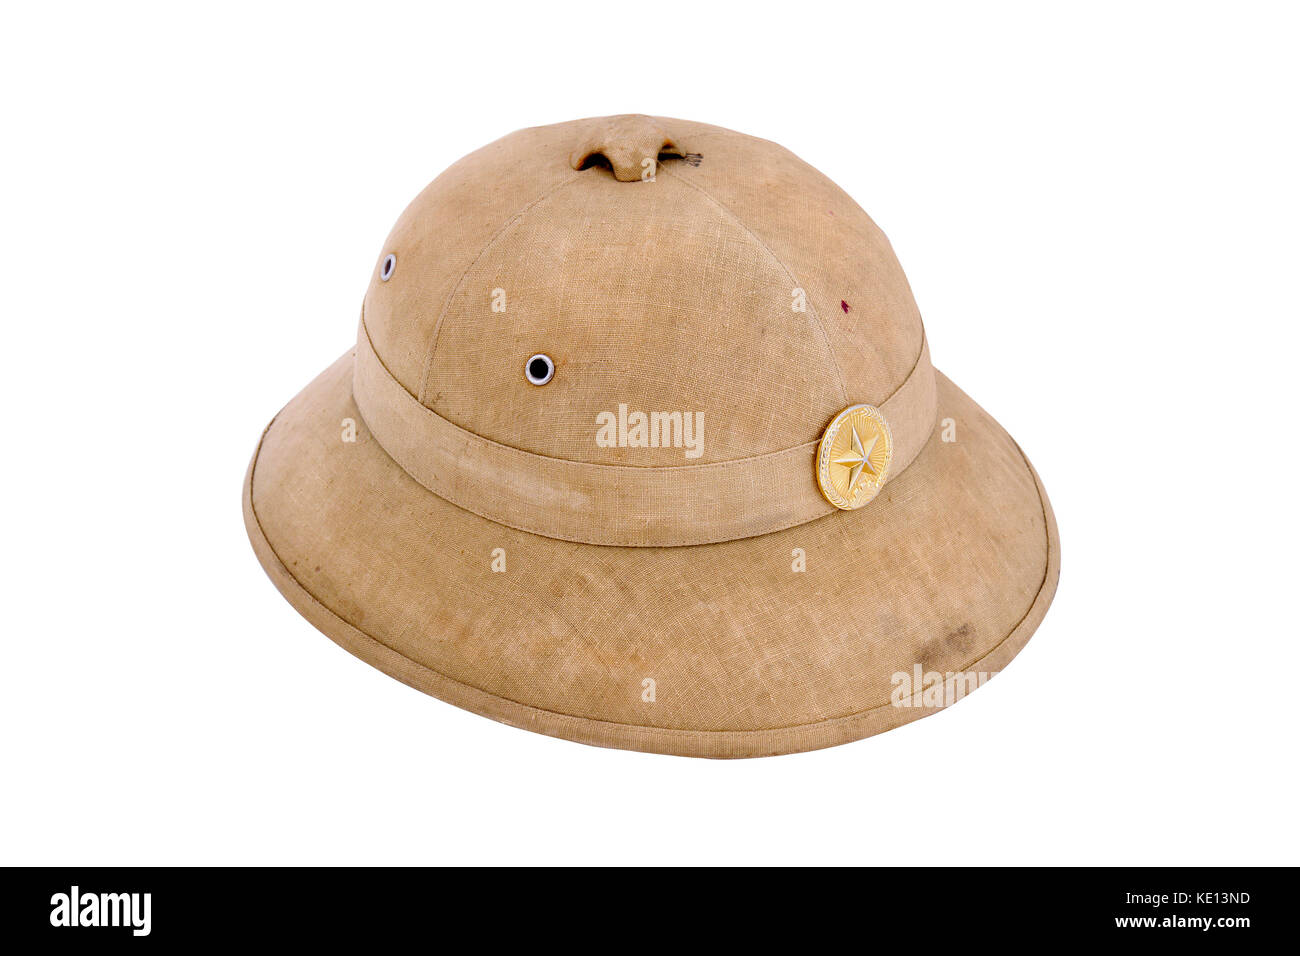 Tropical cork helmet of North Vietnam army. Period of American-Vietnam conflict. (1965-1973) - Stock Image